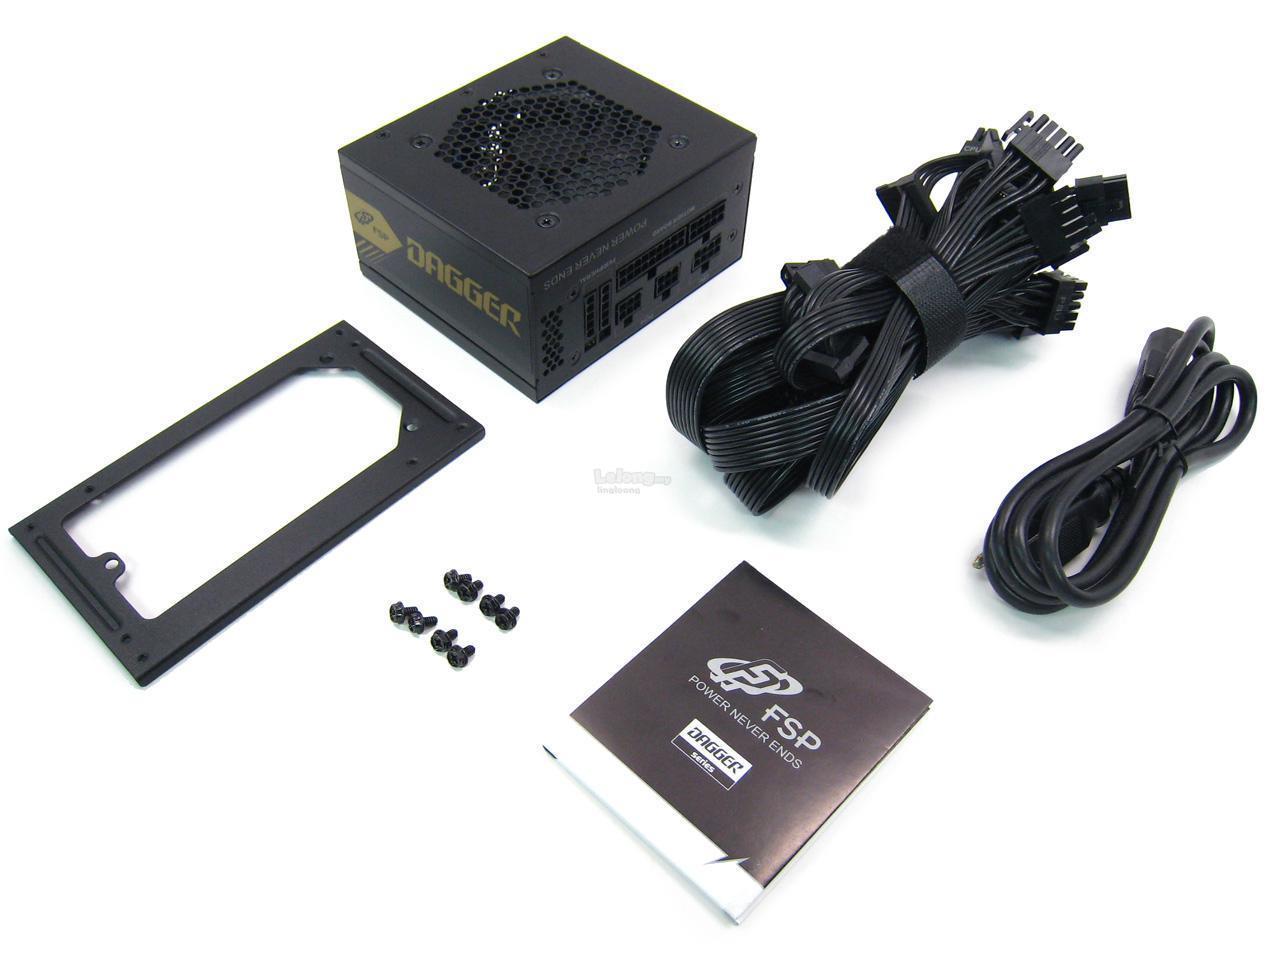 # FSP Dagger Series 600W 80+ Gold SFX Fully Modular Power Supply #